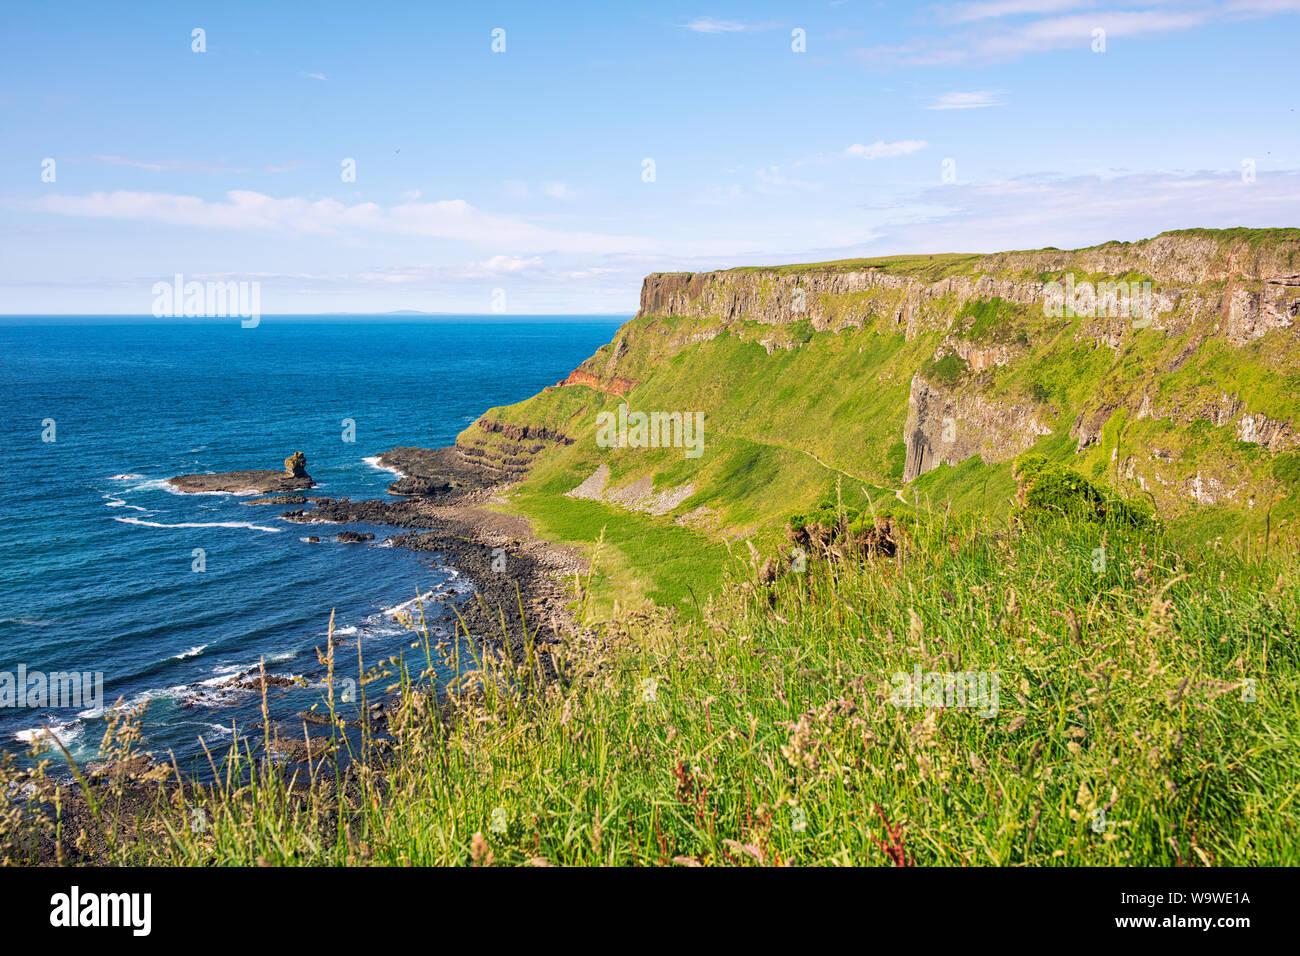 Estate giants causeway litorale,l'Irlanda del Nord Foto Stock